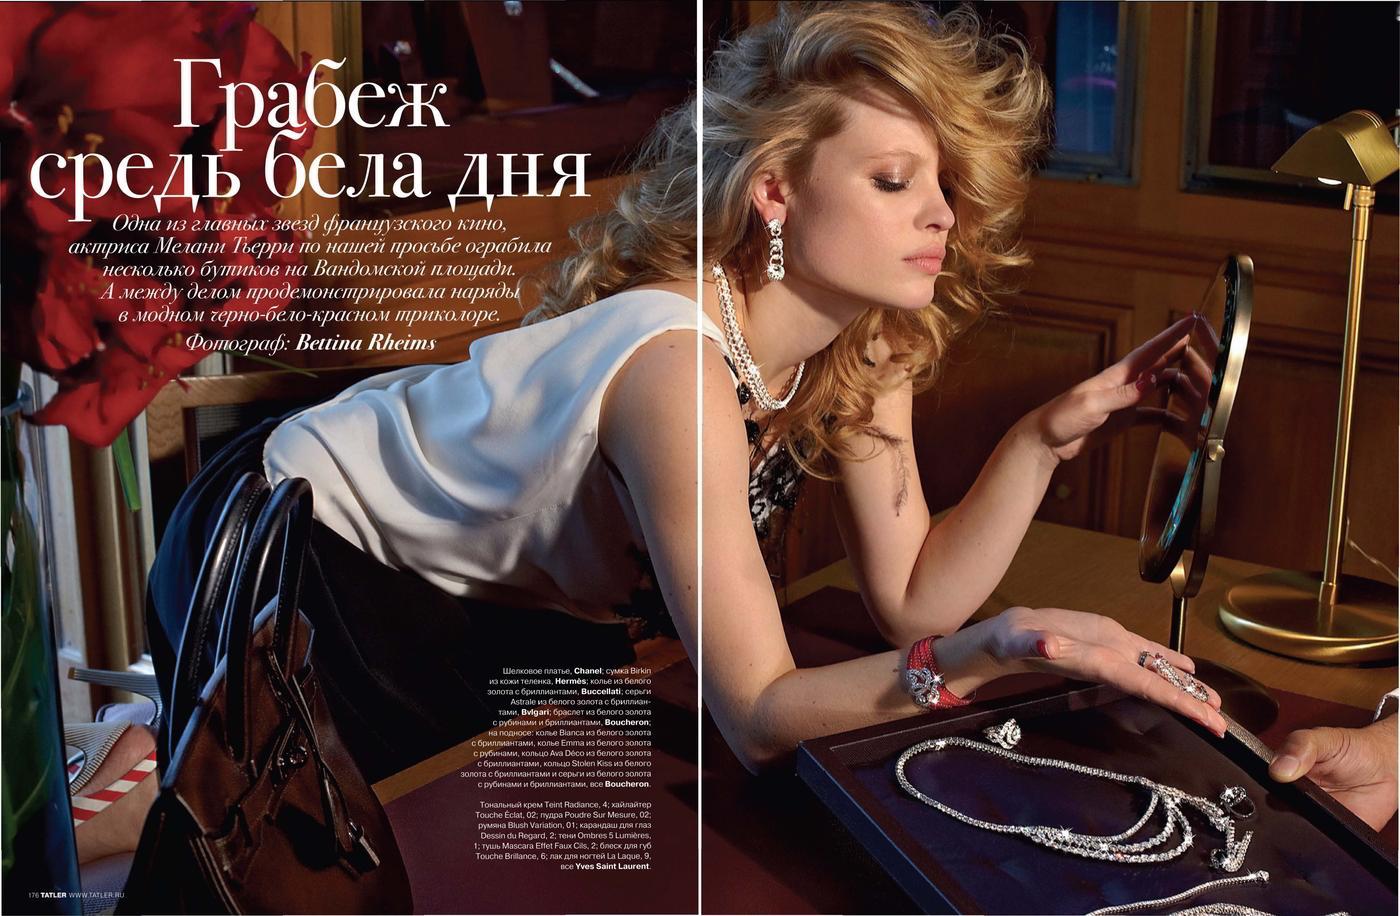 Melanie%20Thierr01%20-%20Daylight%20Robbery%2C%20Tatler%20Russia%2C%20April%202011.jpg